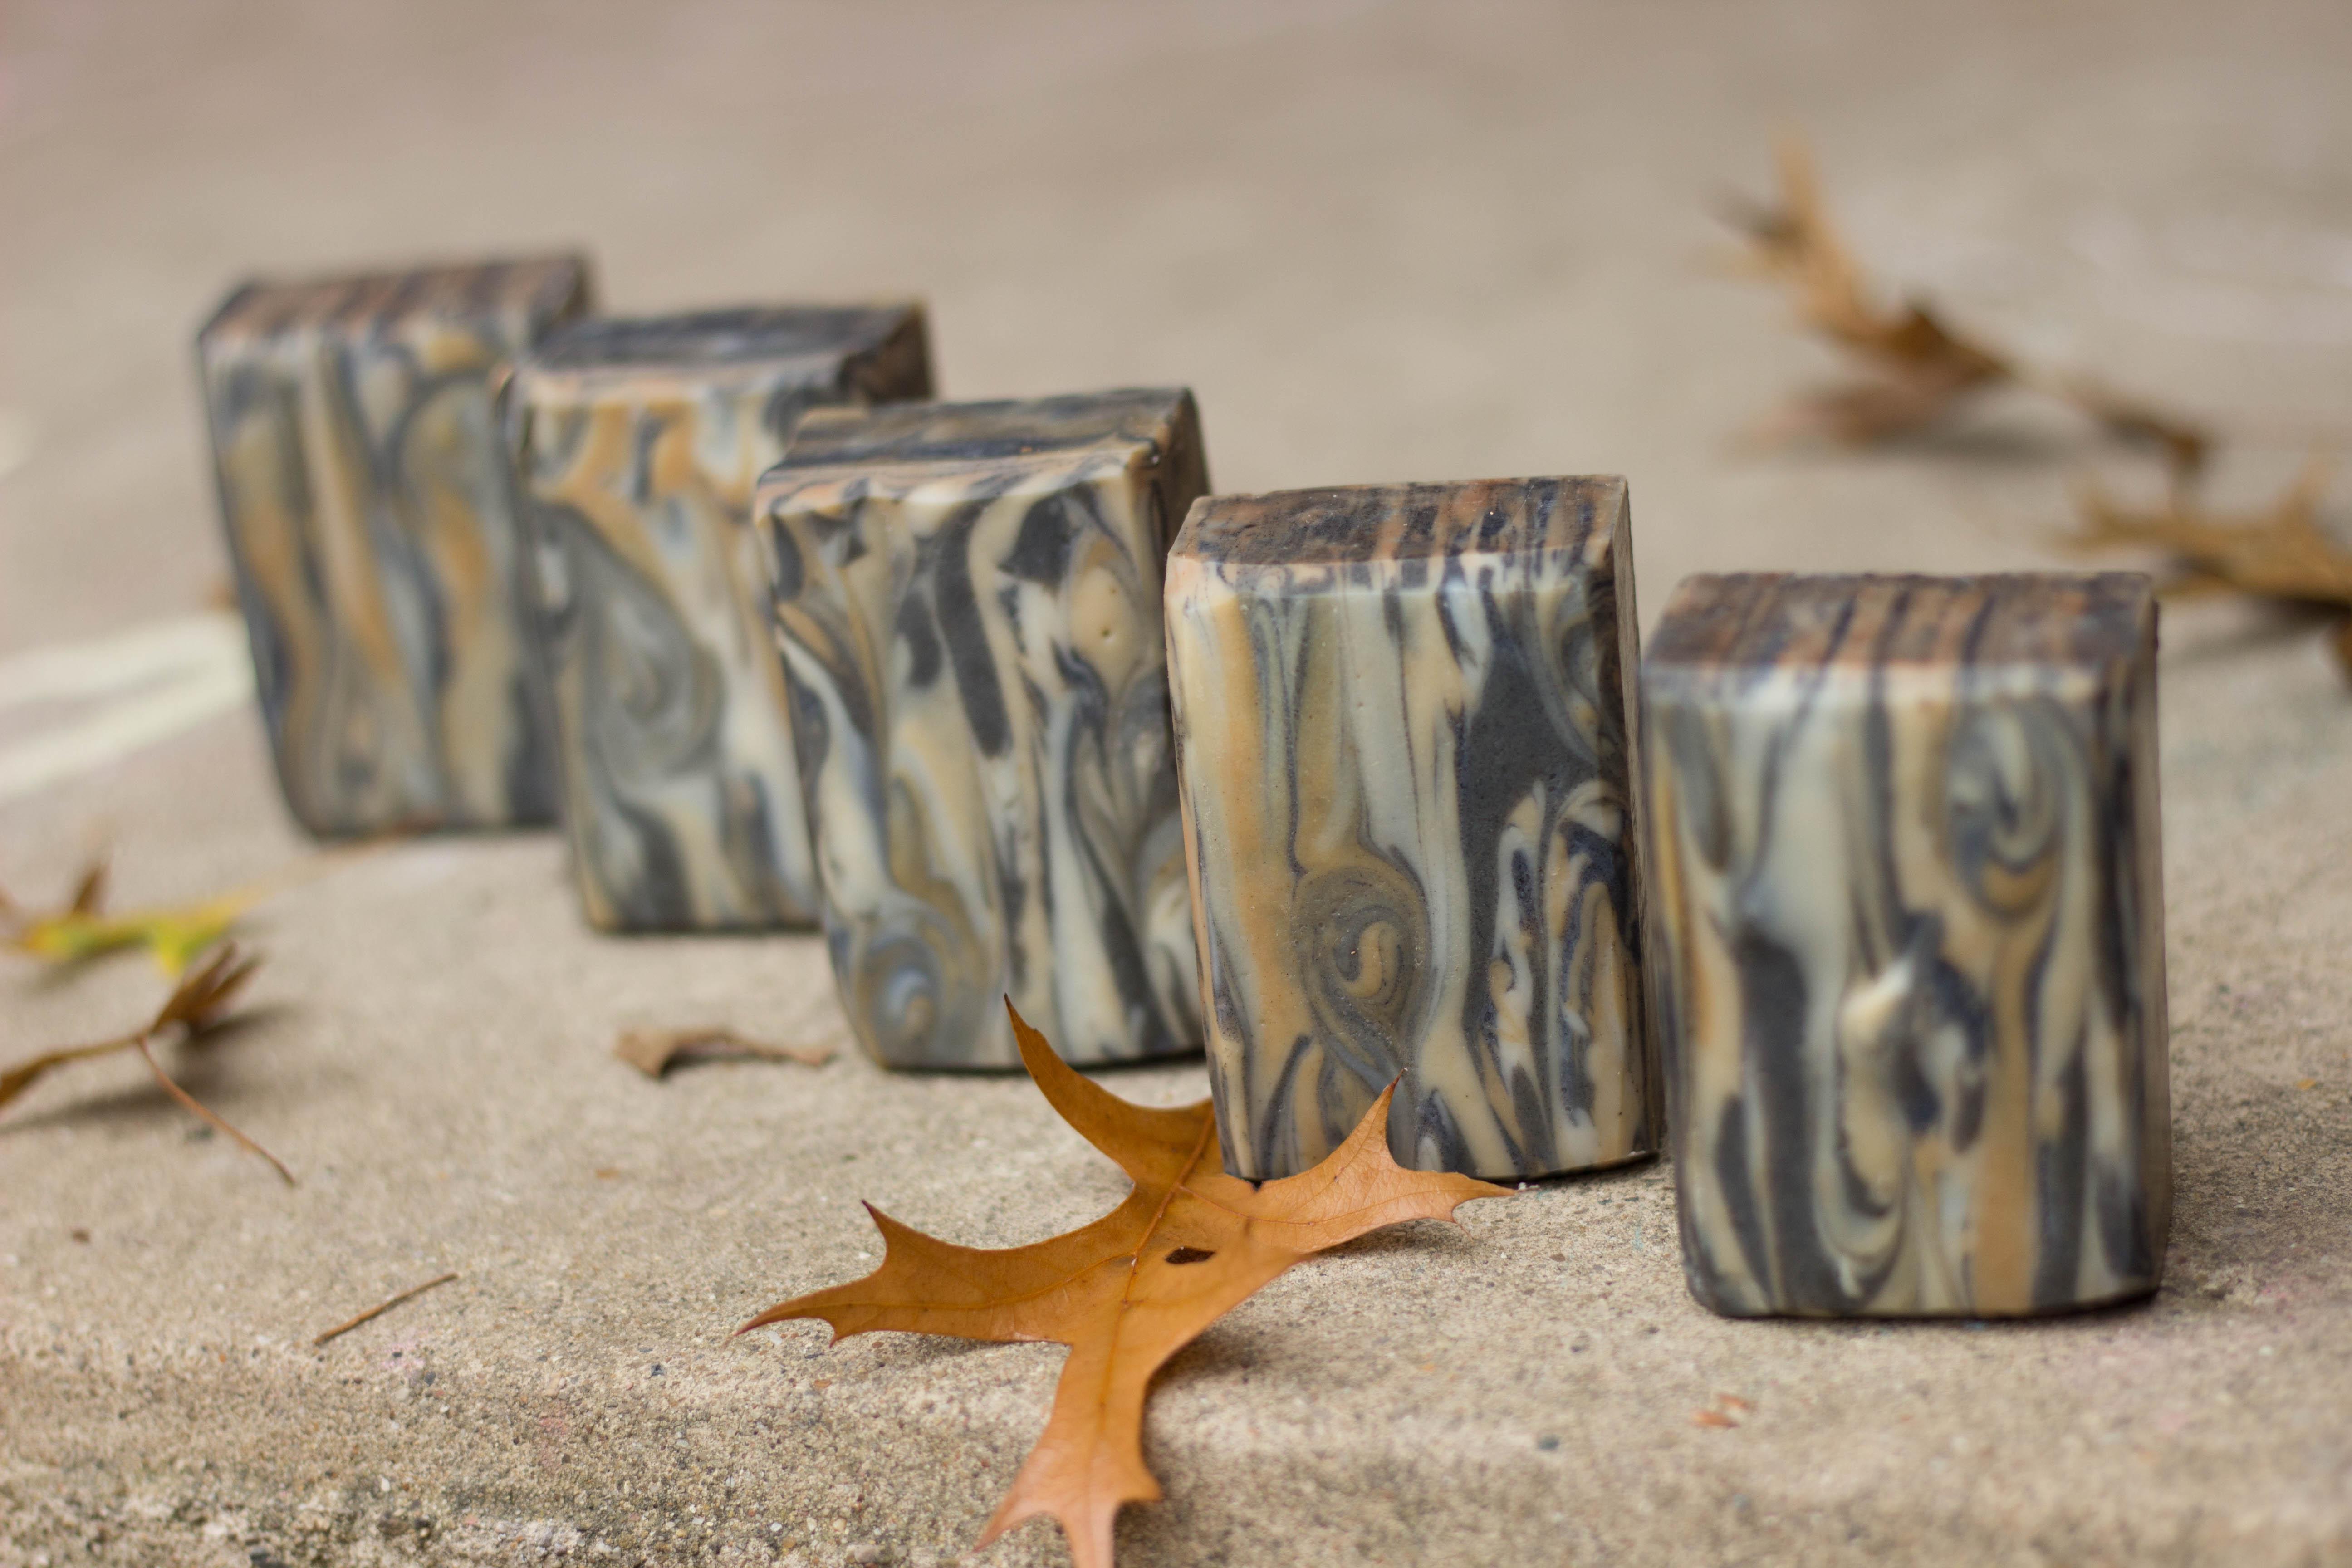 sandalwood wood grain soap